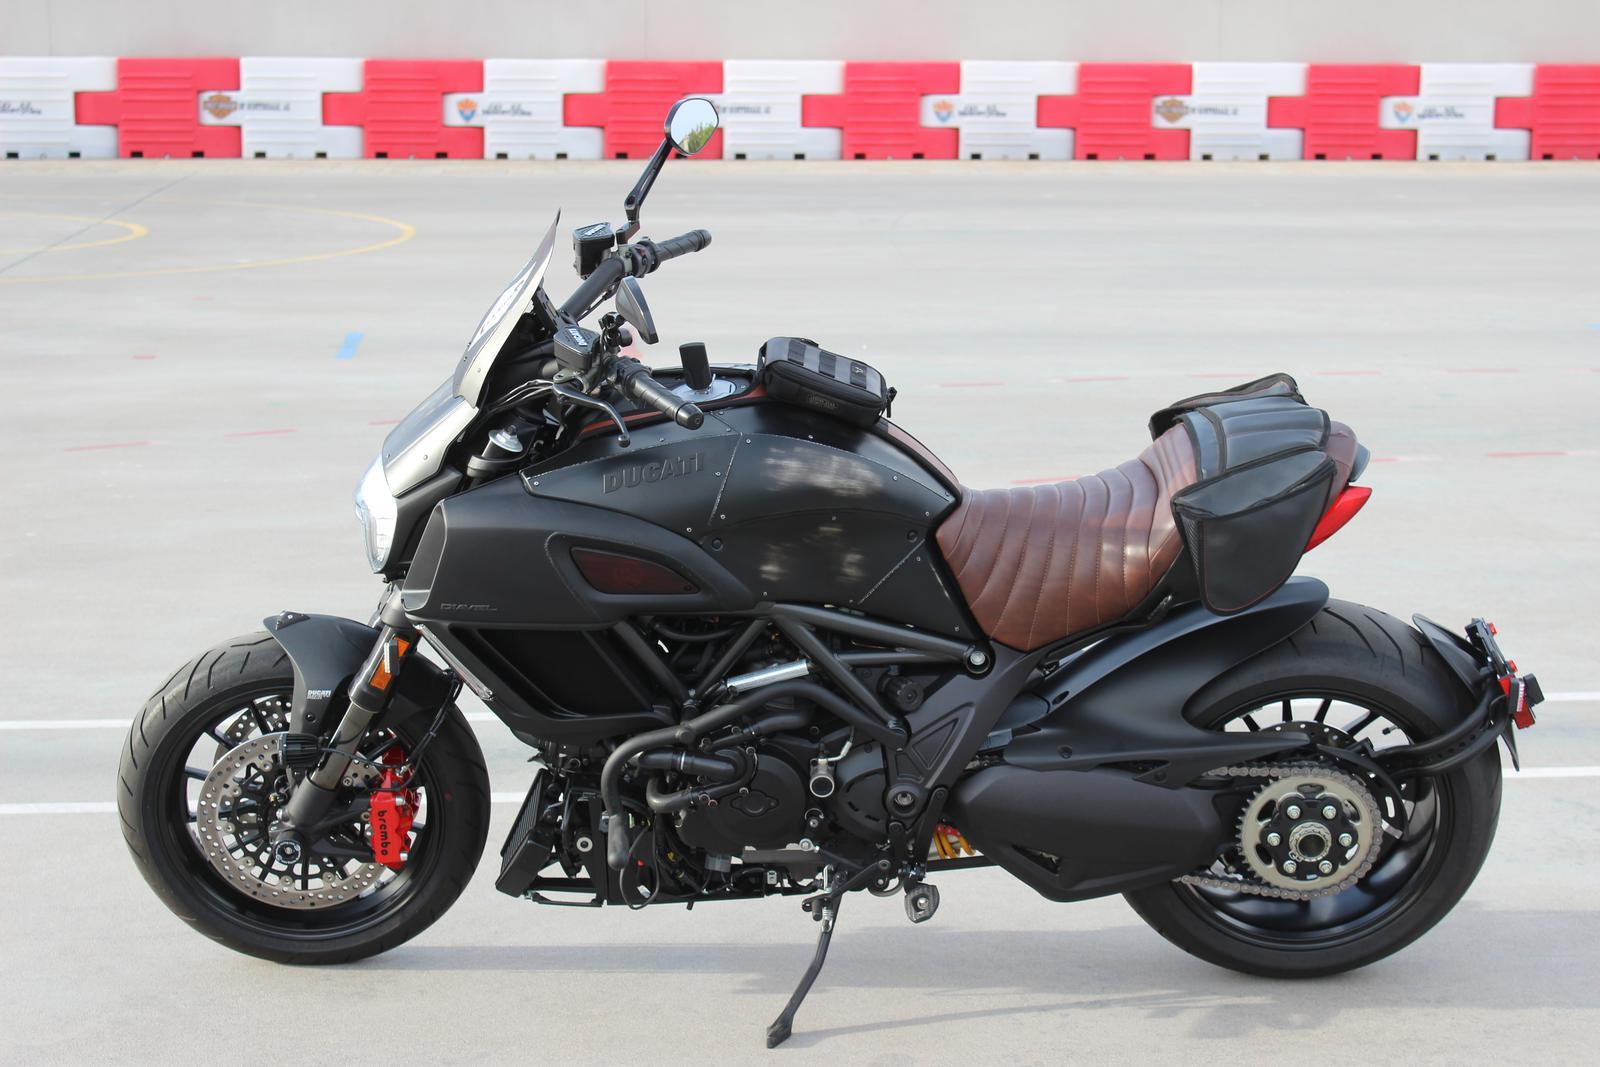 2017 Ducati Diavel sel for sale in Scottsdale, AZ   GO AZ ...